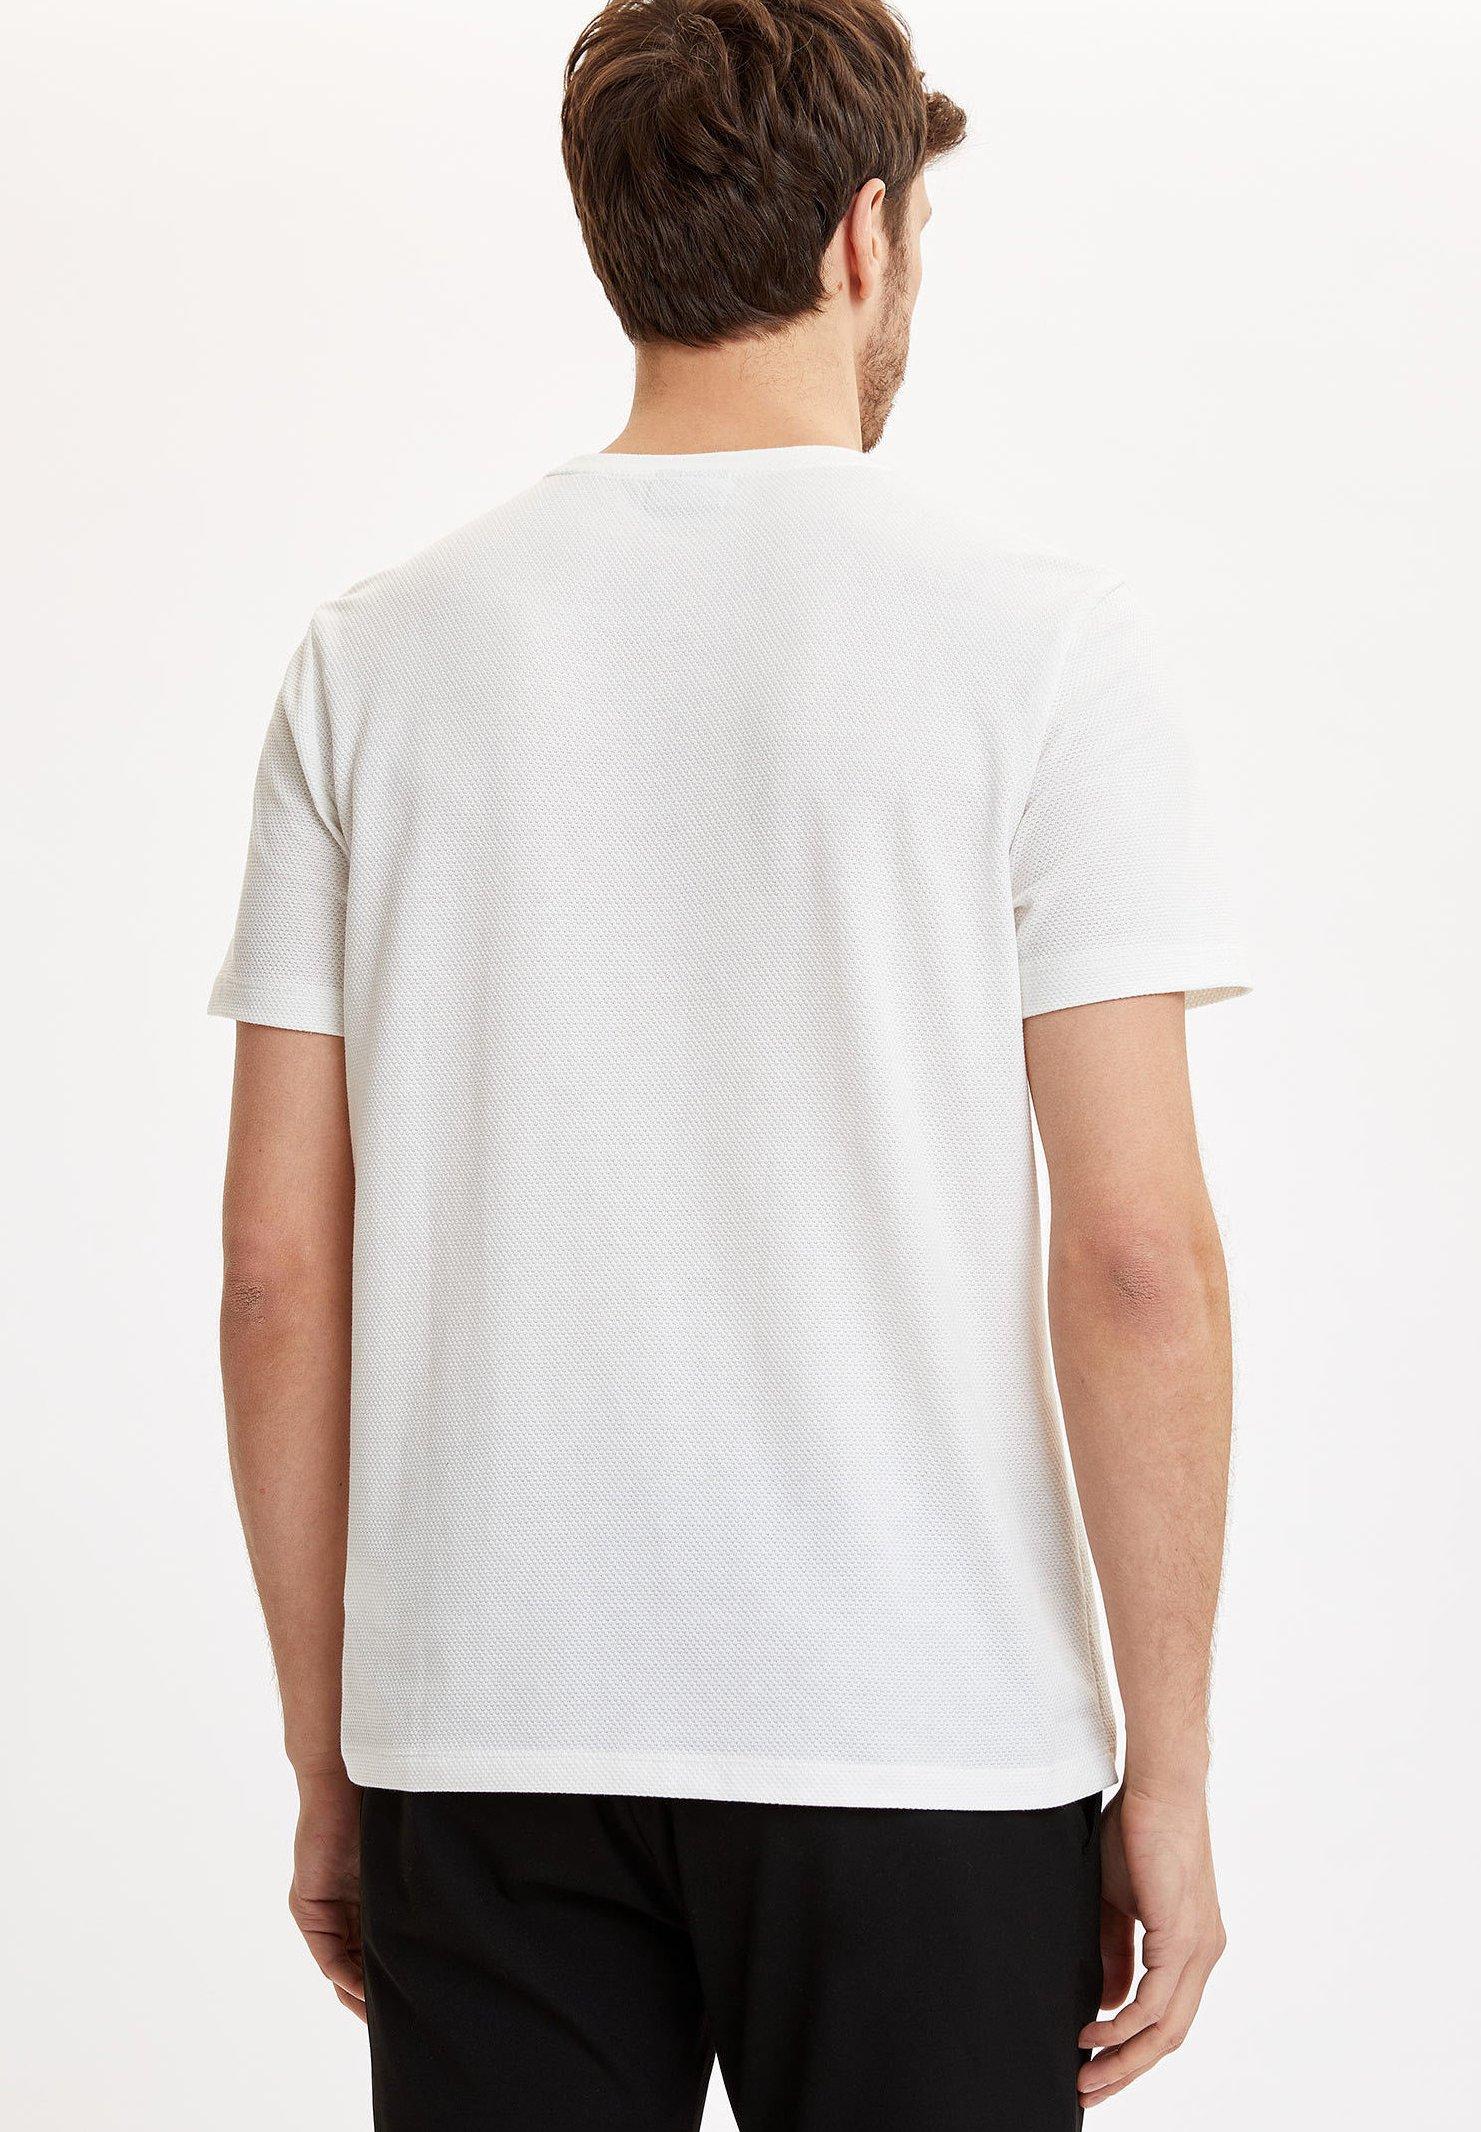 DeFacto Print T-shirt - white x1GvC